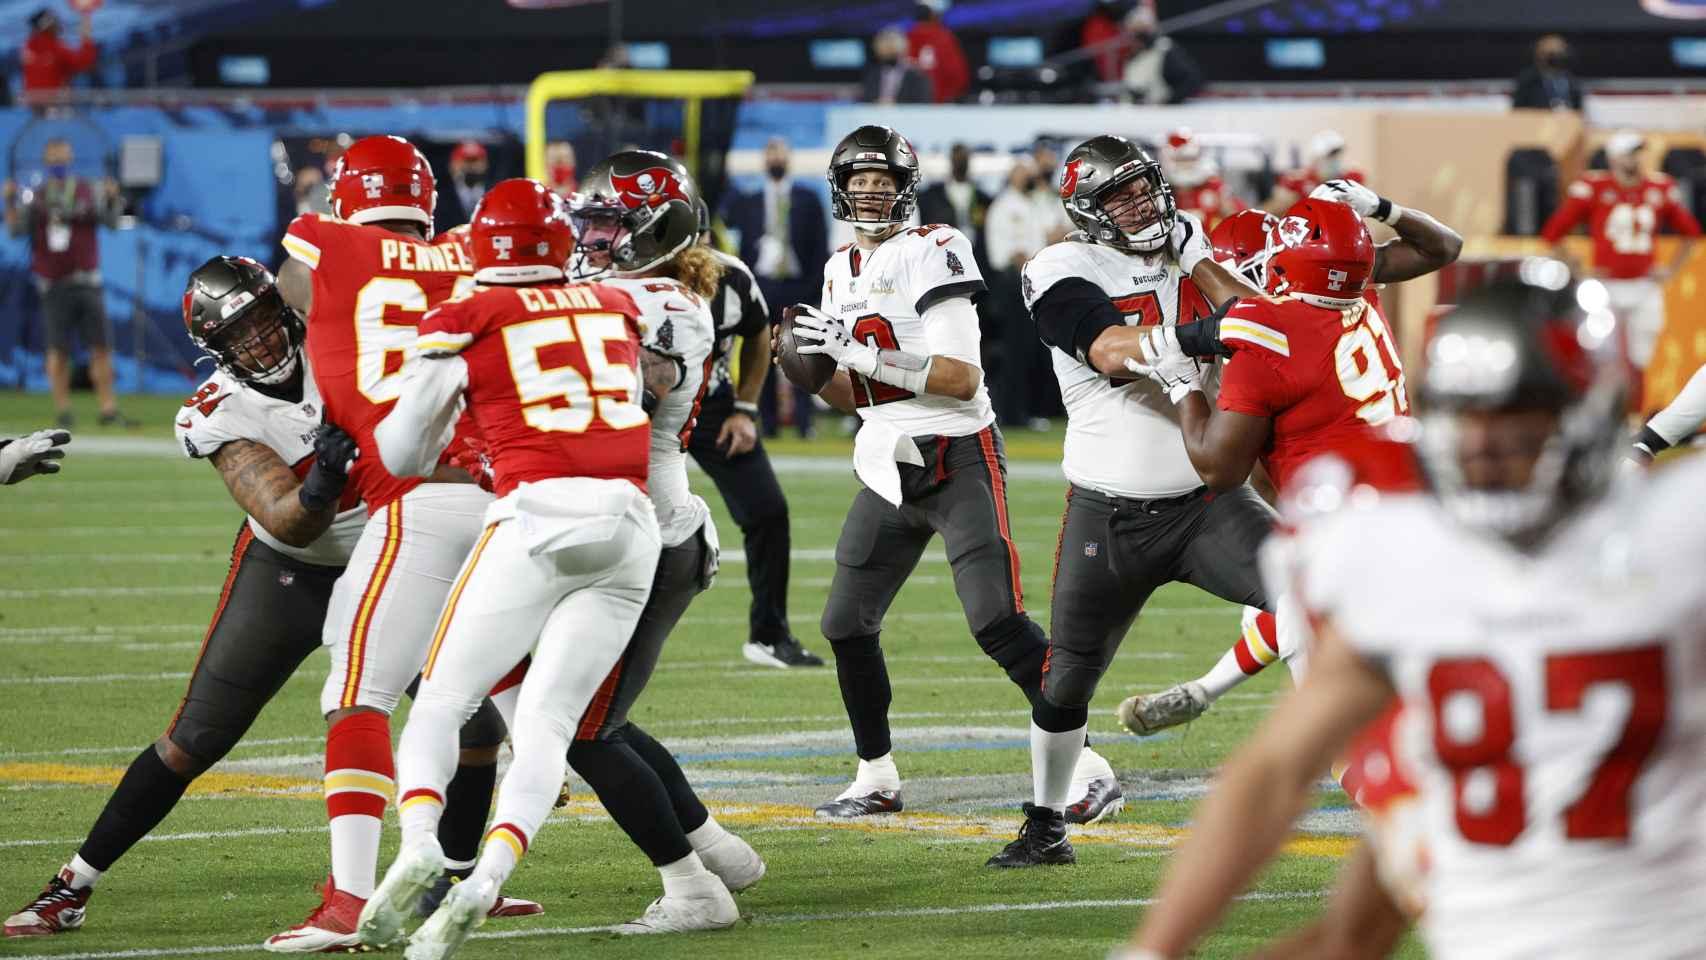 Tom Brady busca el pase a Rob Gronkowski para lograr el segundo touchdown del partido